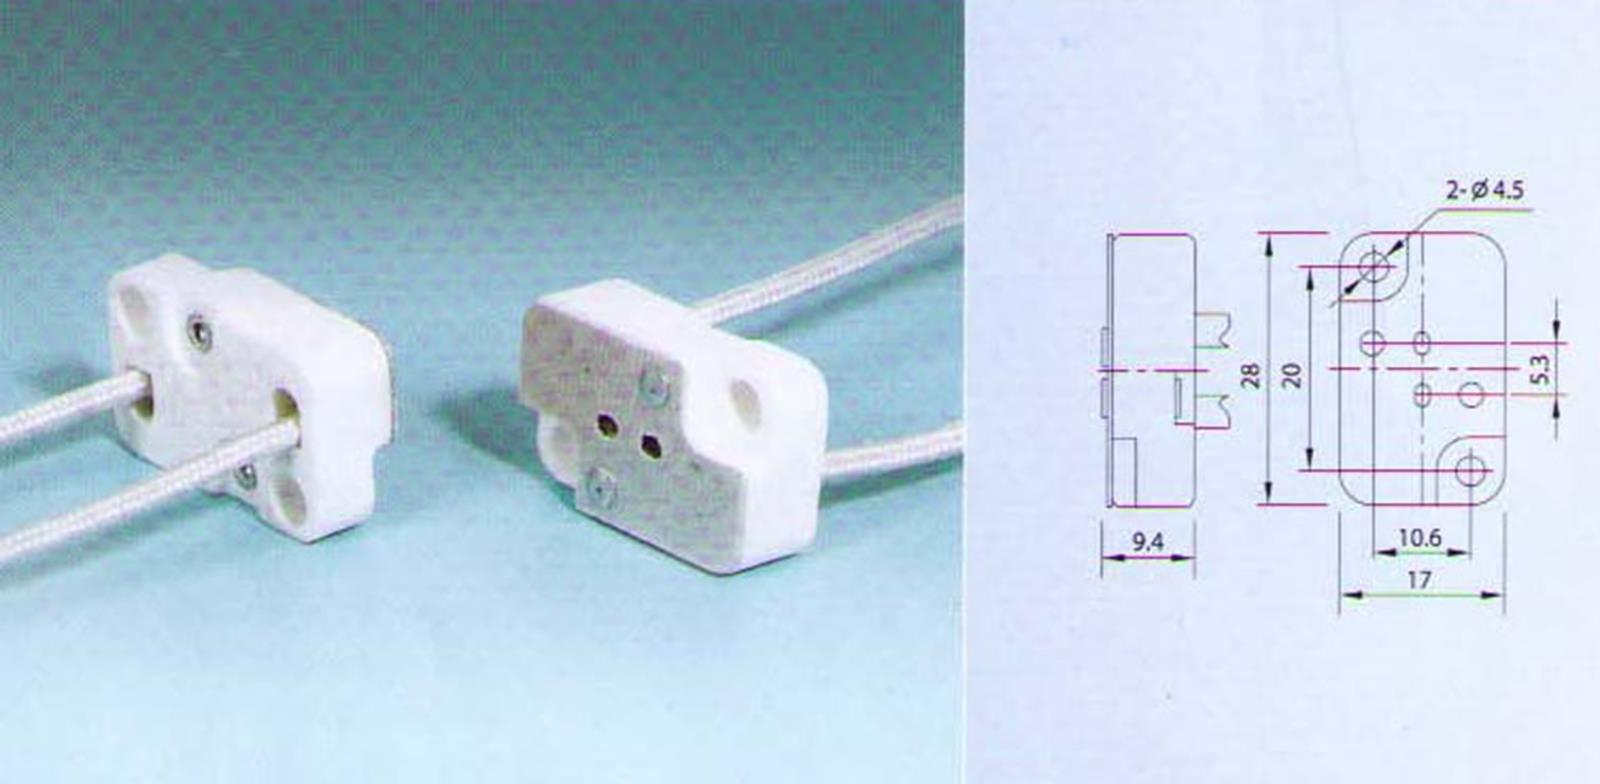 4 Qty. Divine Lighting Square Multi-base Socket Lamp Holder G5.3 GX5.3 G6.35 GX6.35 Works With : ELC; BRL; 64514; EHJ; etc.